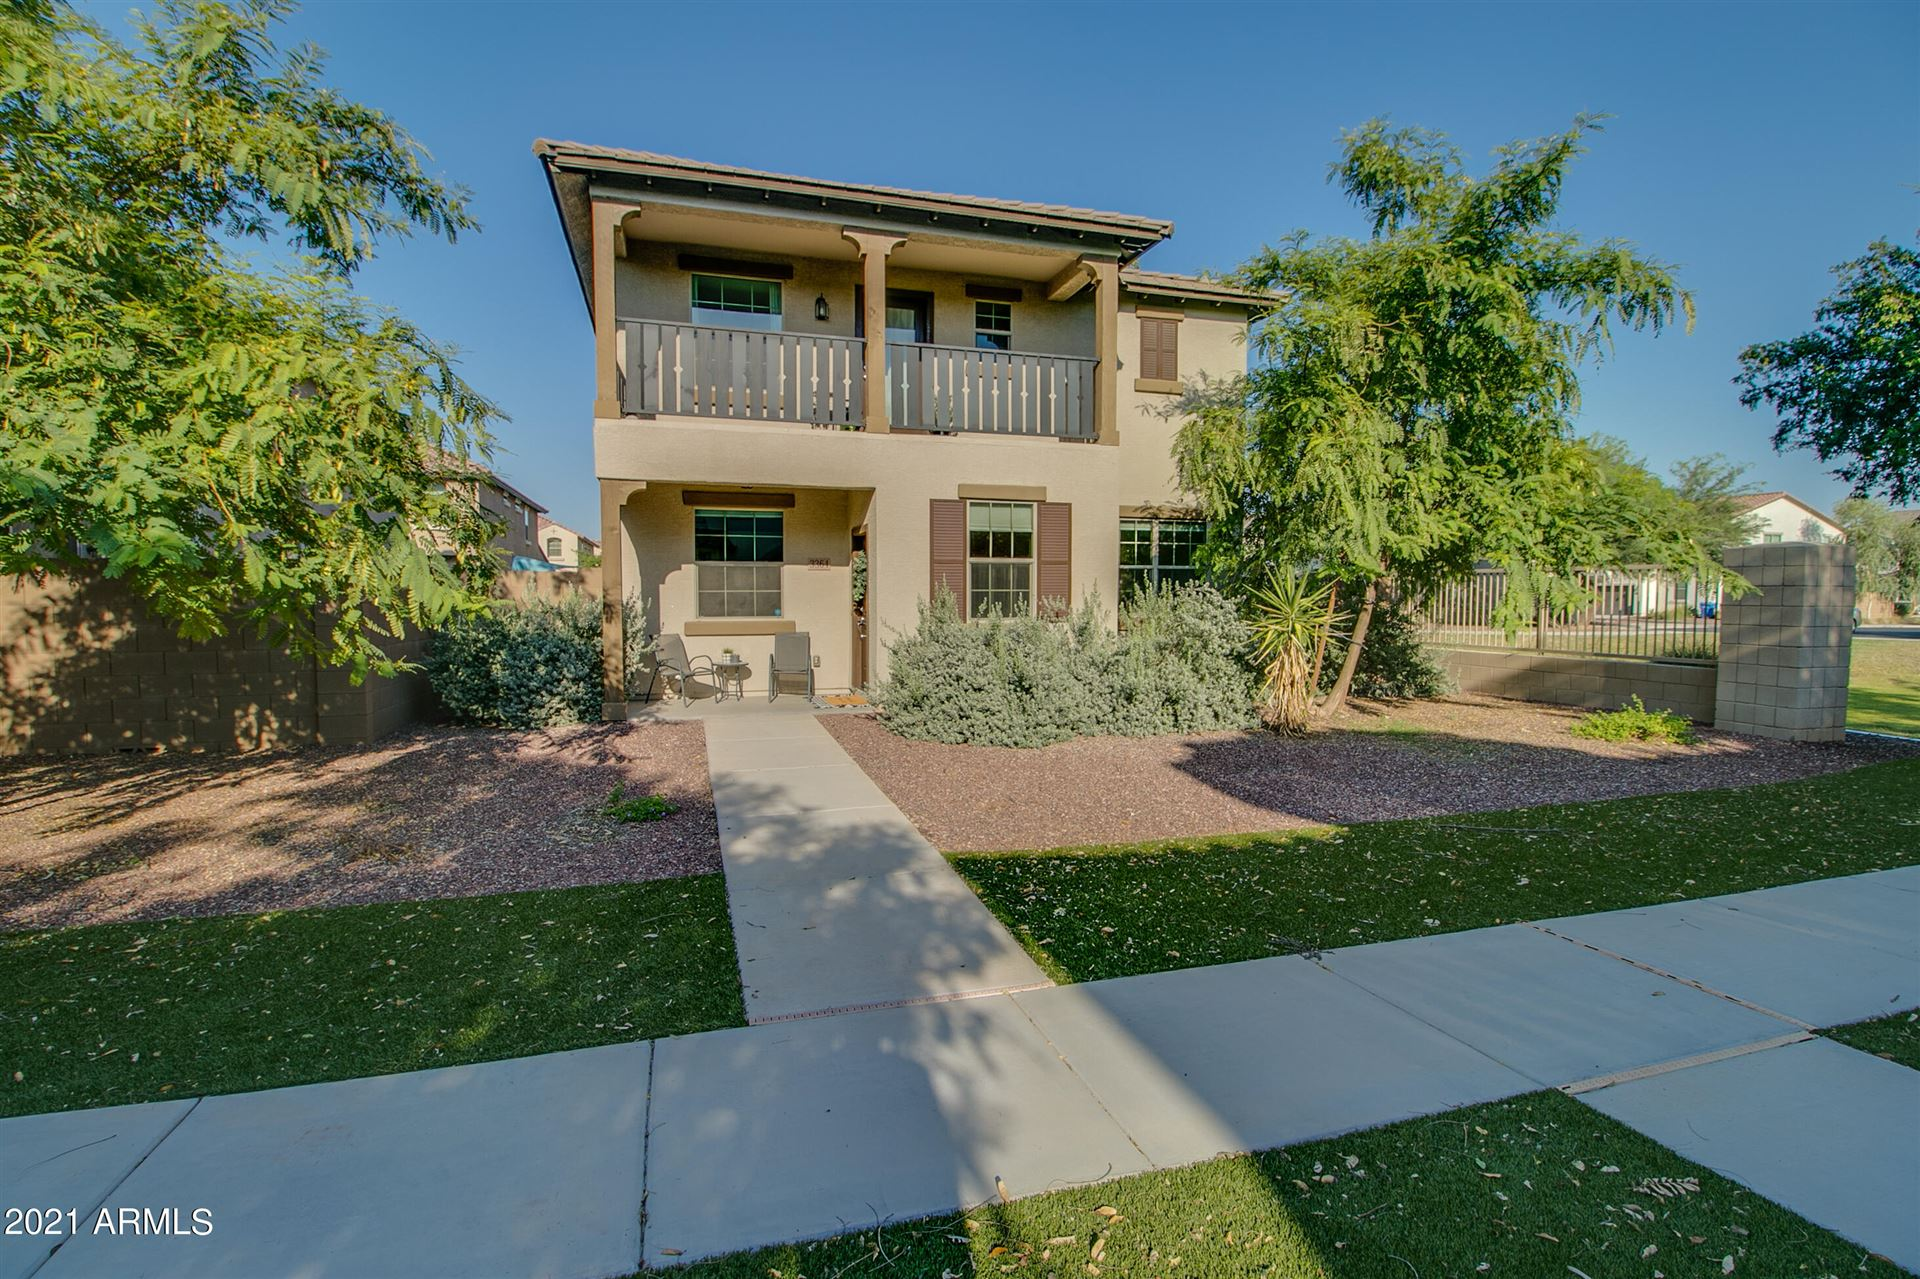 Photo of 3364 W HAYDUK Road, Laveen, AZ 85339 (MLS # 6291939)